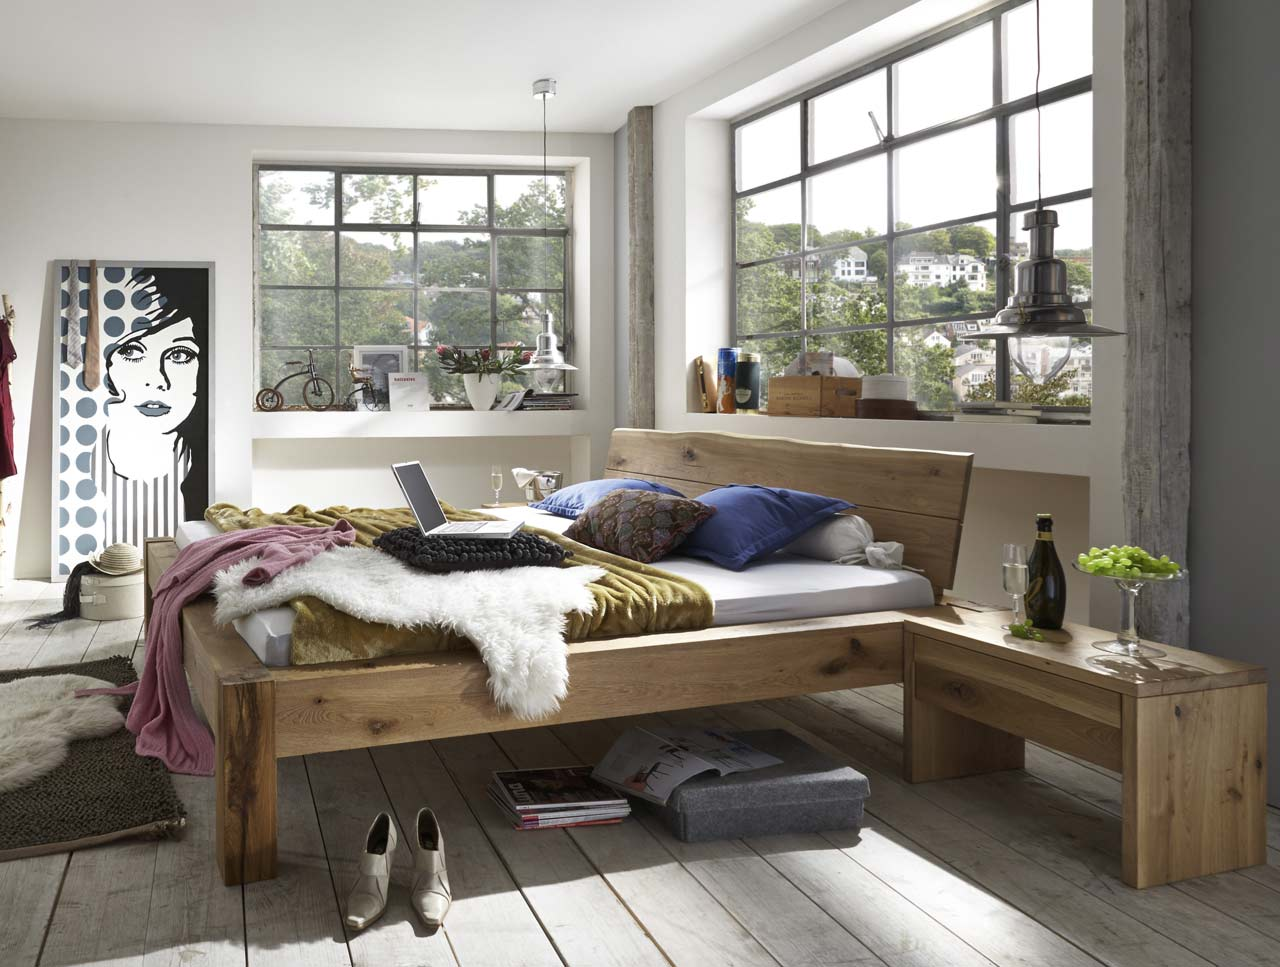 m h massivholz bett baumkante. Black Bedroom Furniture Sets. Home Design Ideas